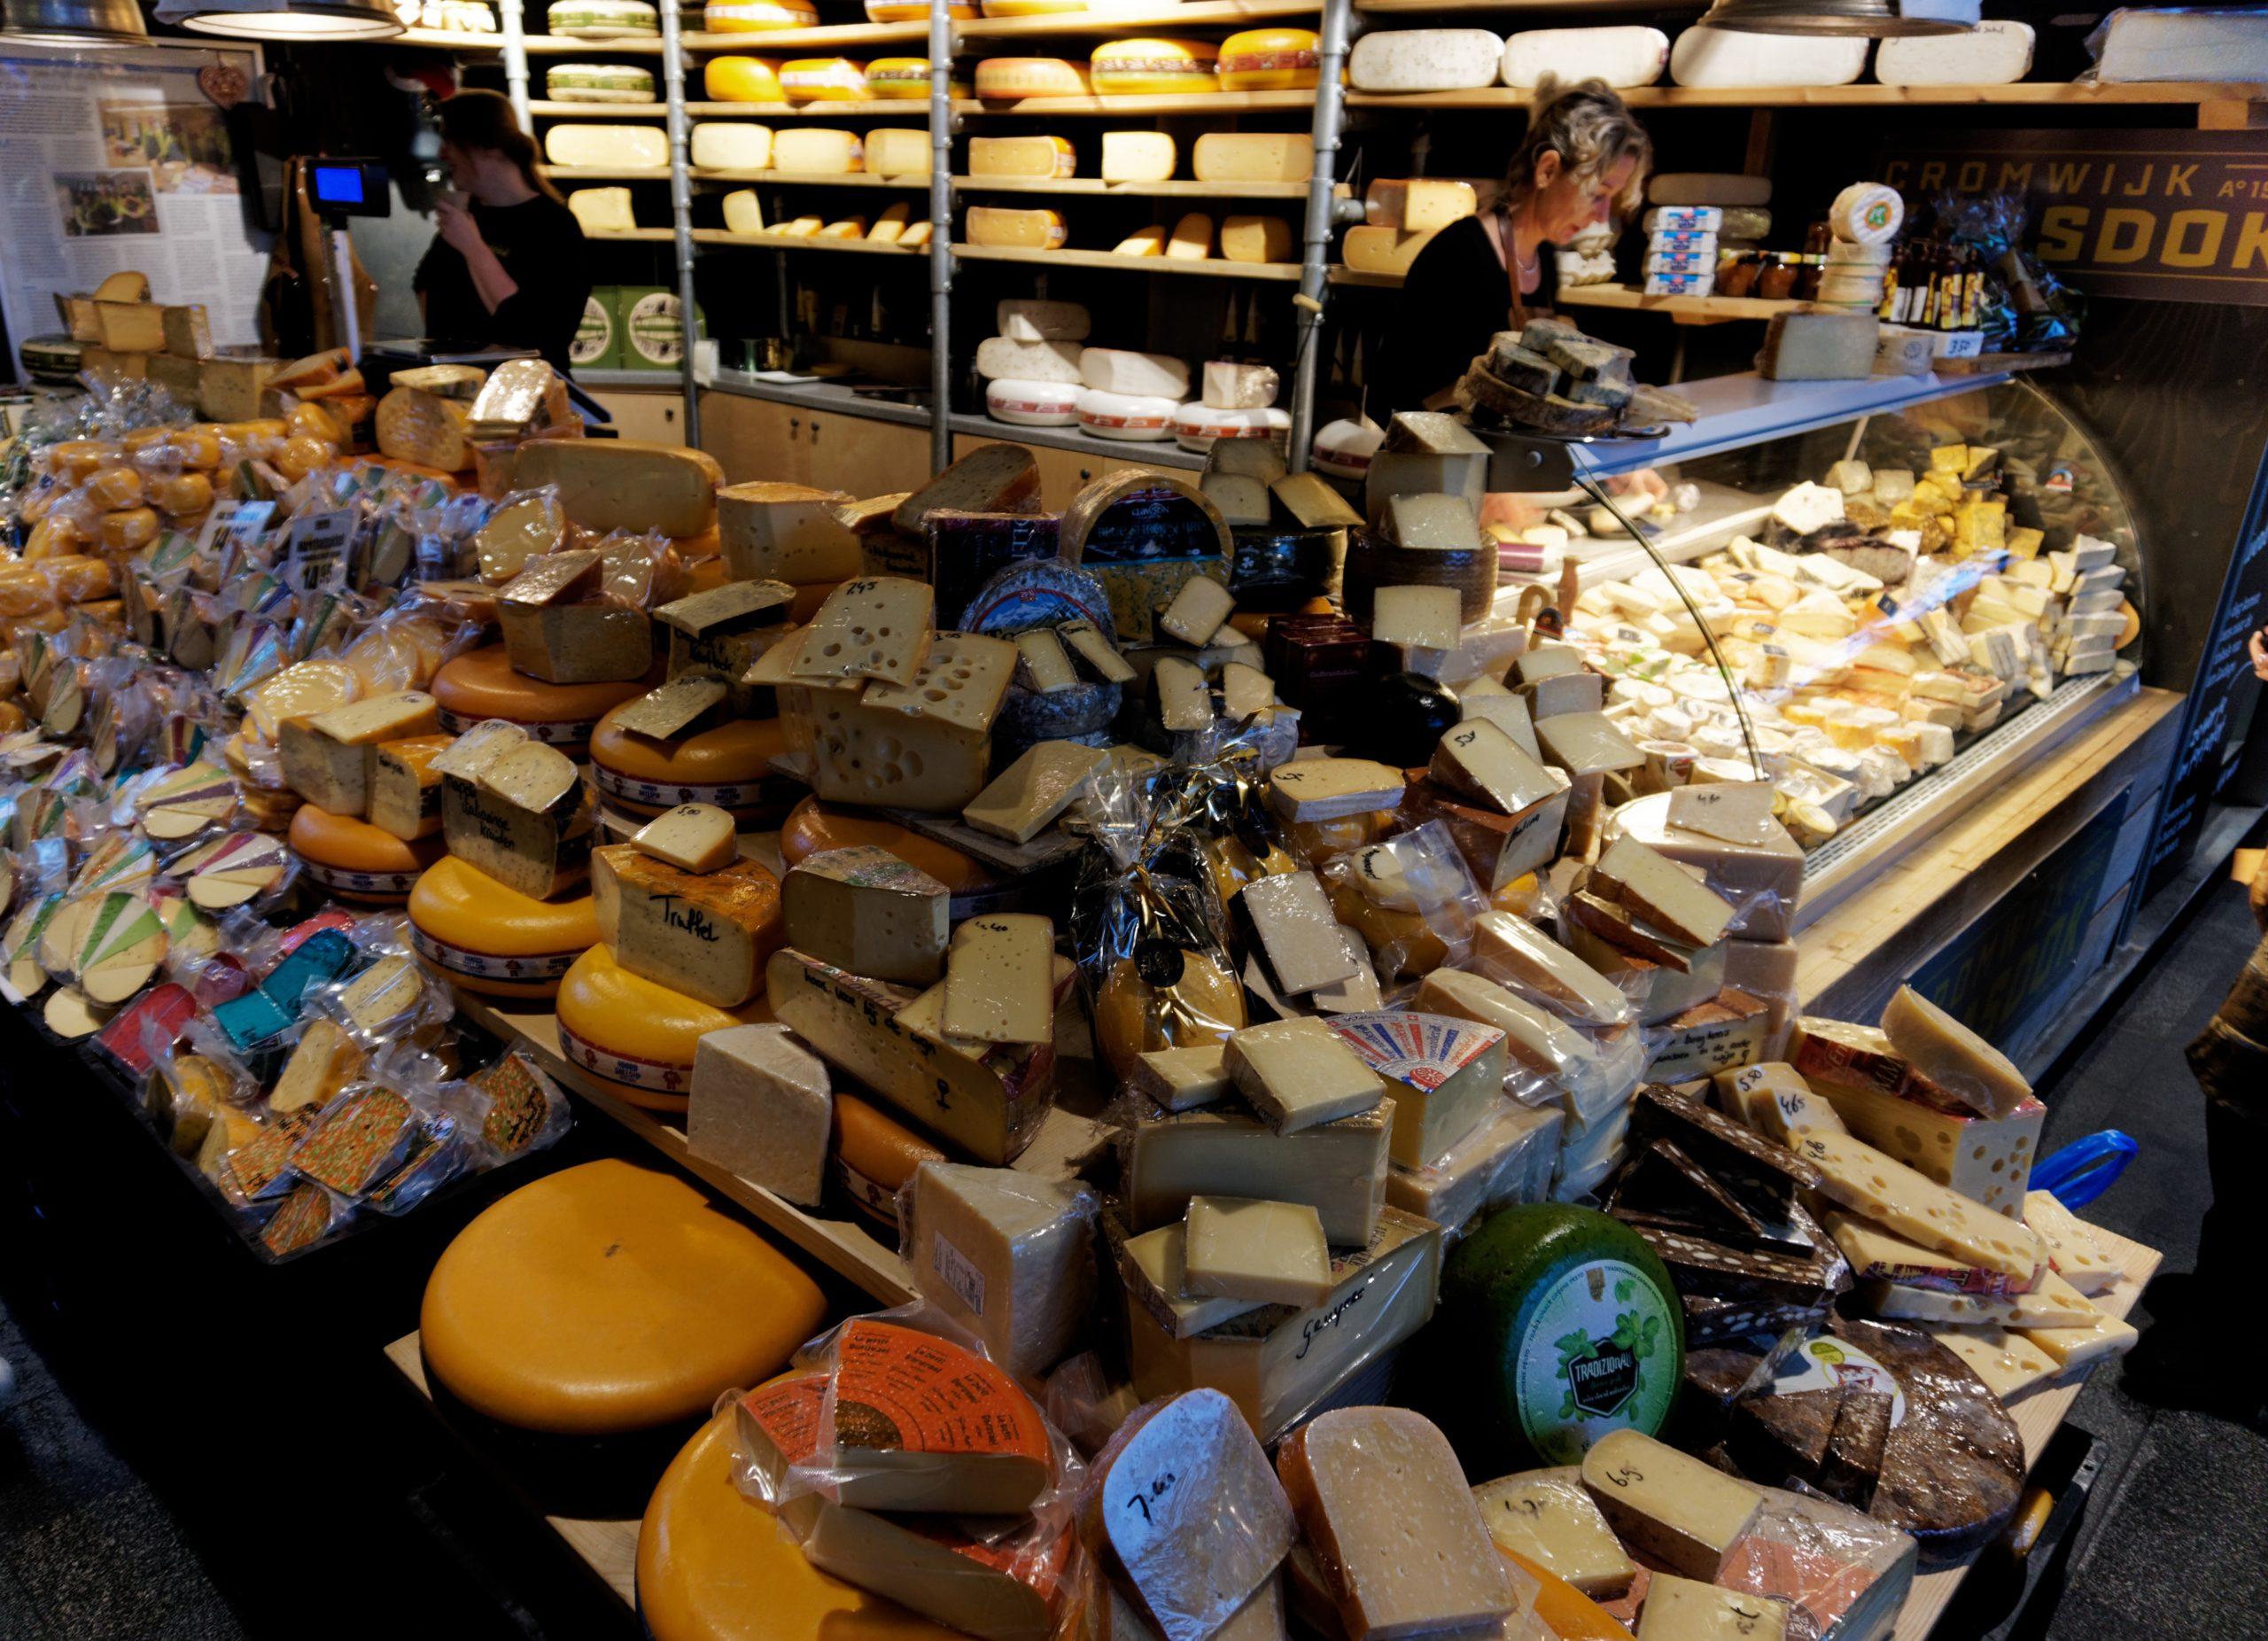 etale-de-fromage-vue-aumarkthal-de-rotterdam